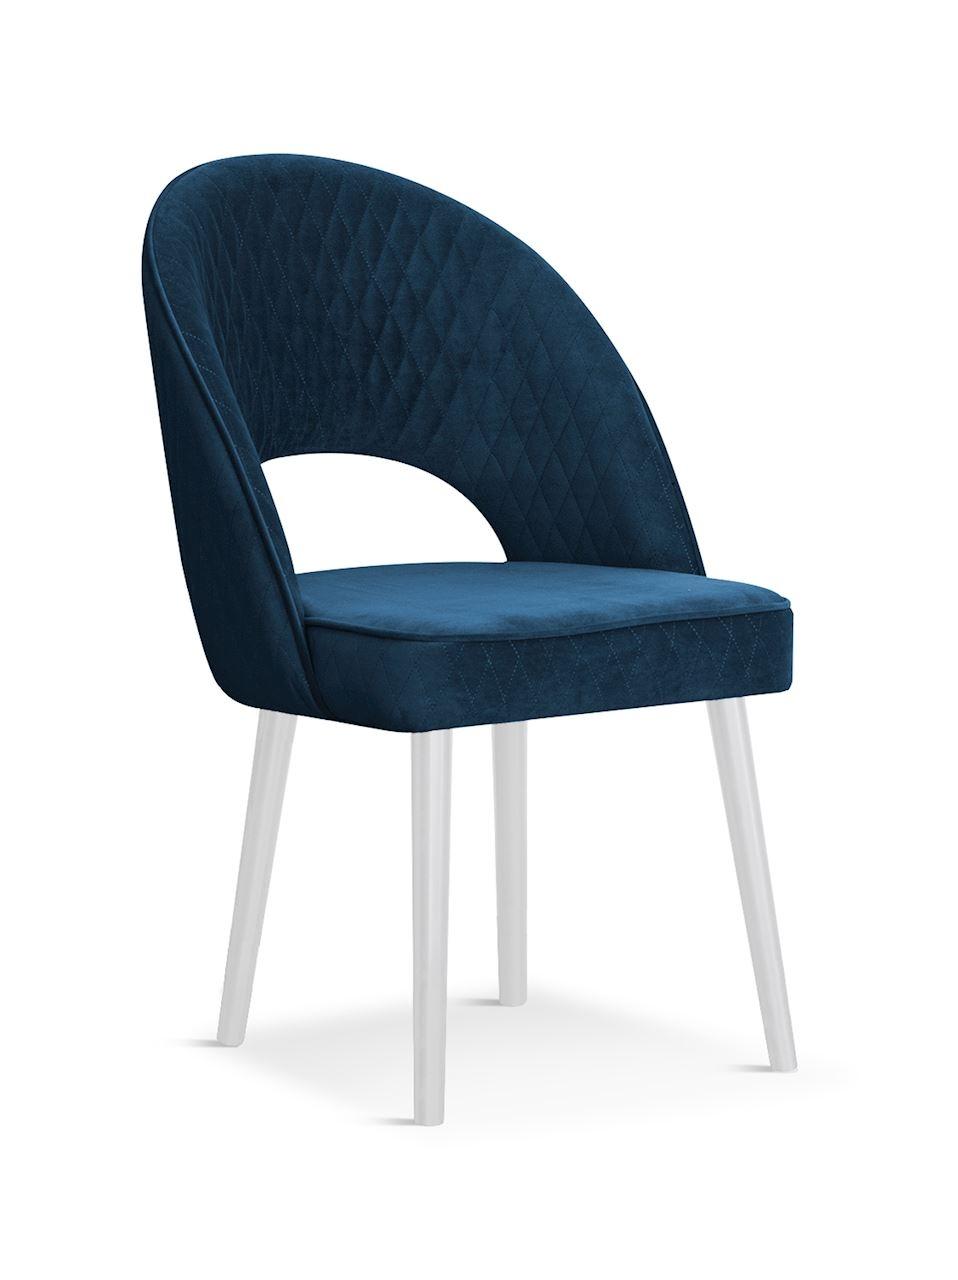 Scaun tapitat cu stofa, cu picioare din lemn Ponte Navy Blue / White, l56xA63xH89 cm